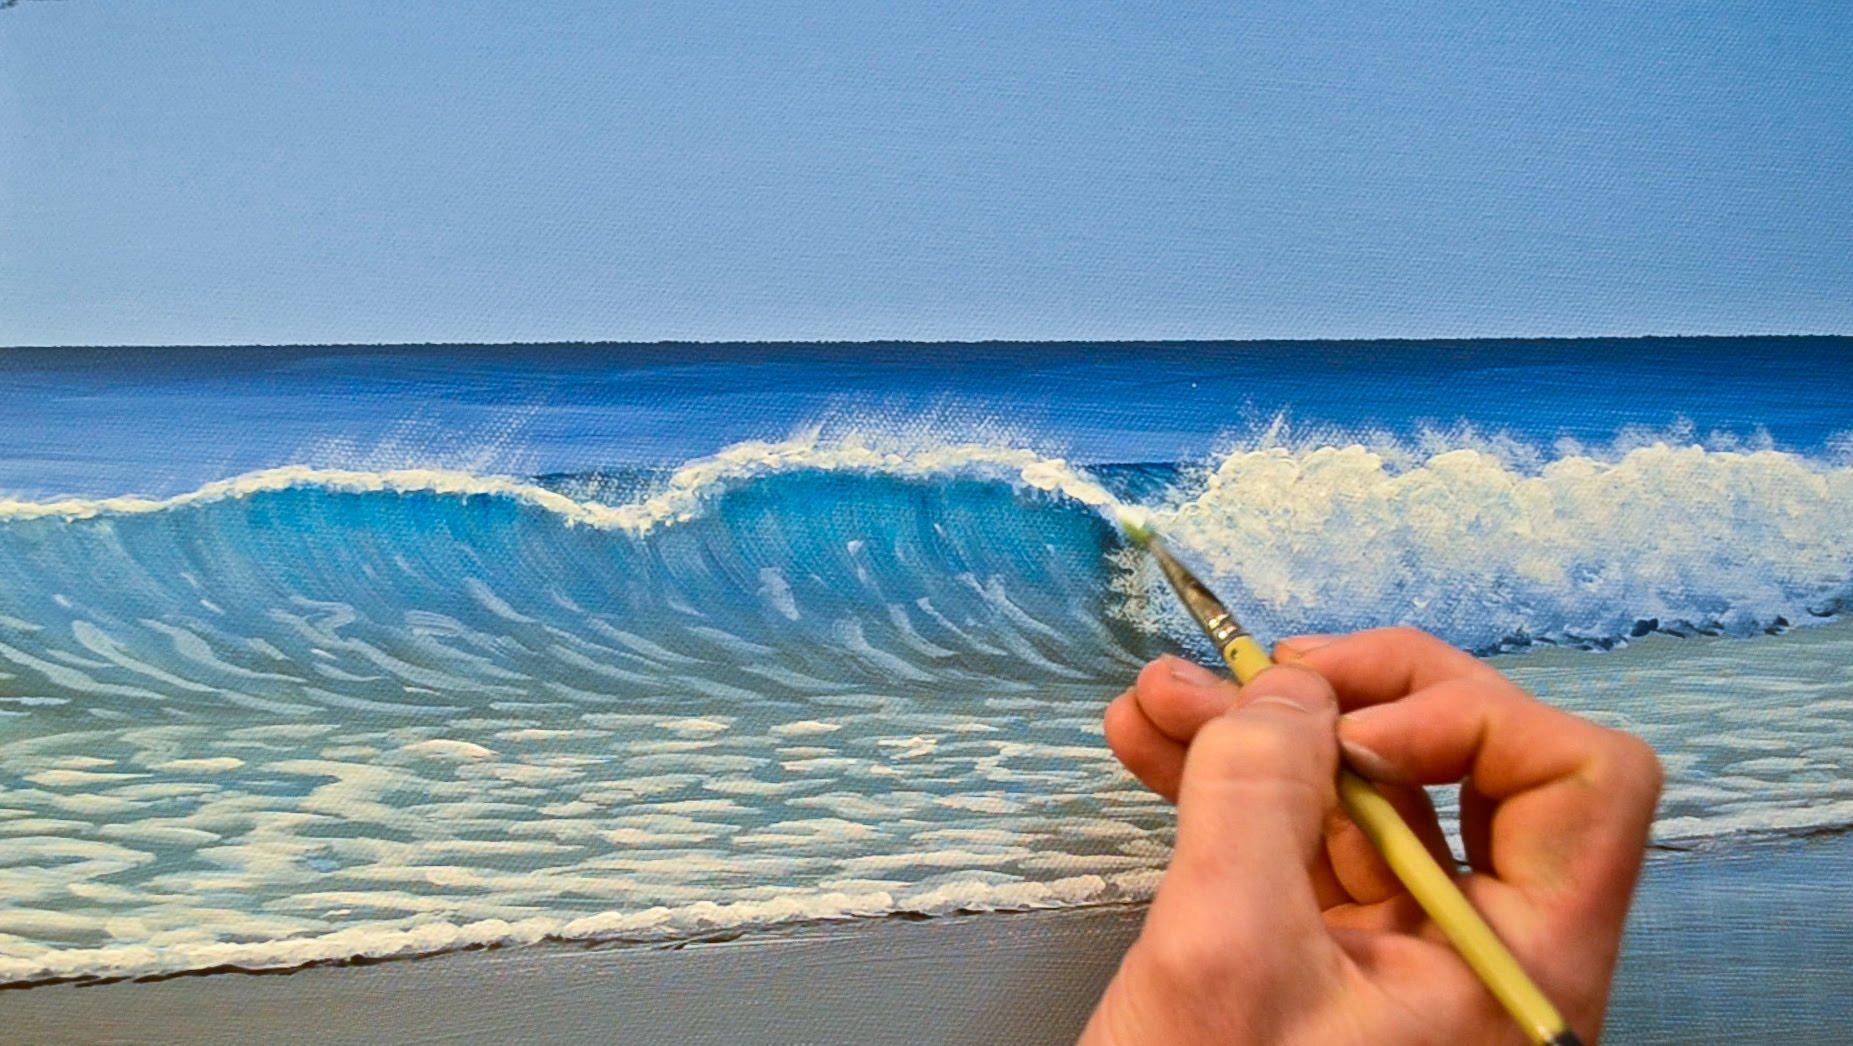 beach waves painting at